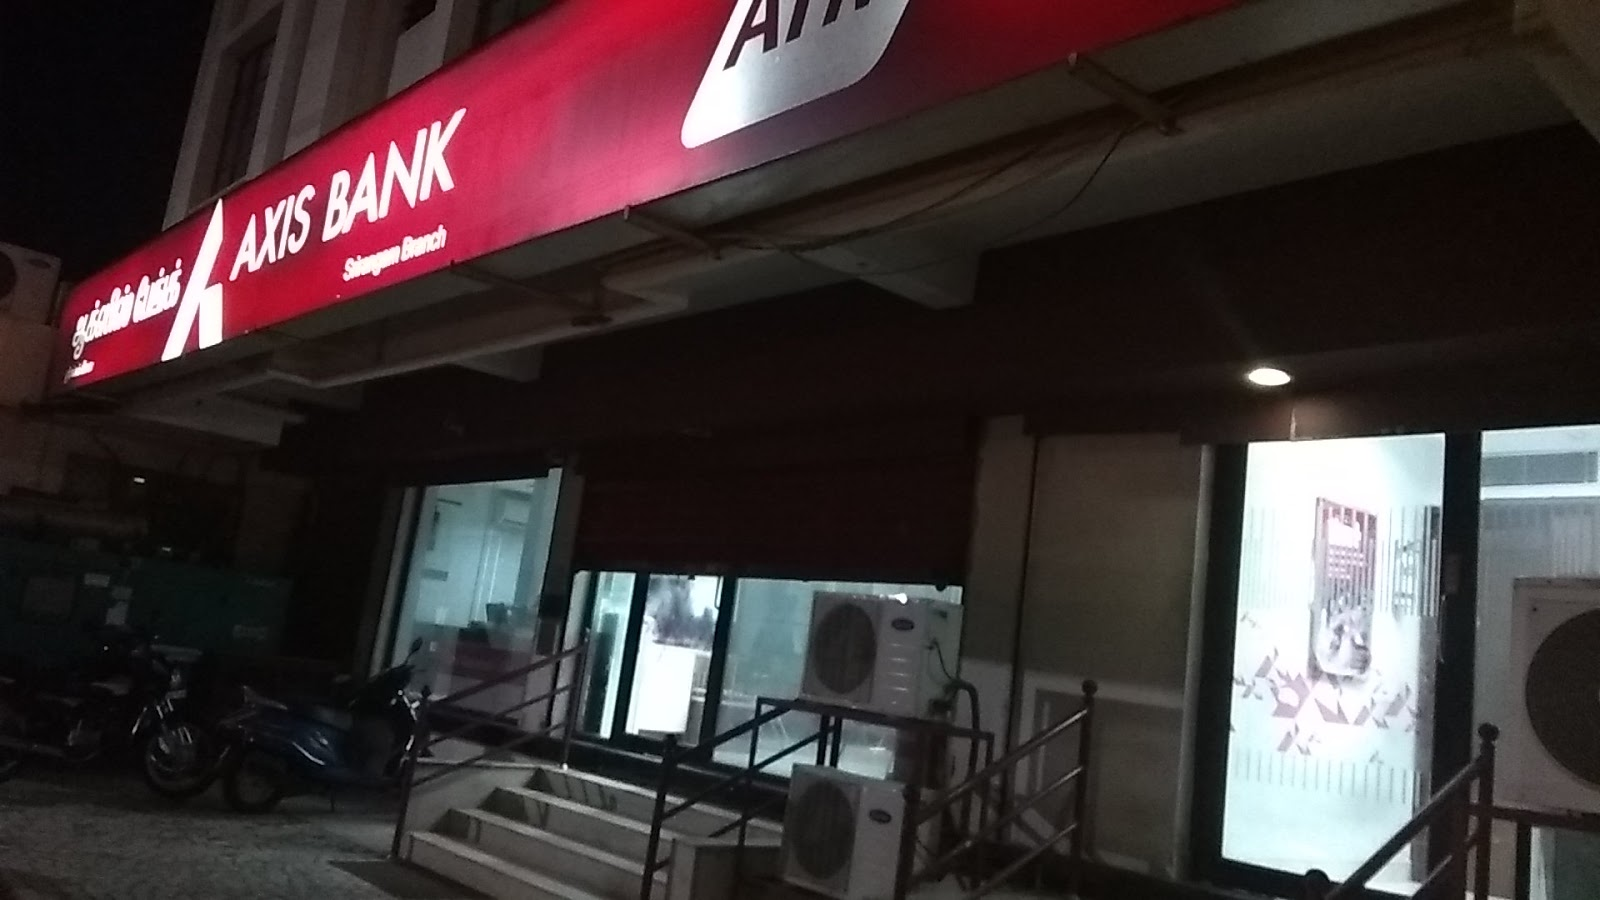 blood bank Axis Bank near Tiruchirappalli Tamil Nadu